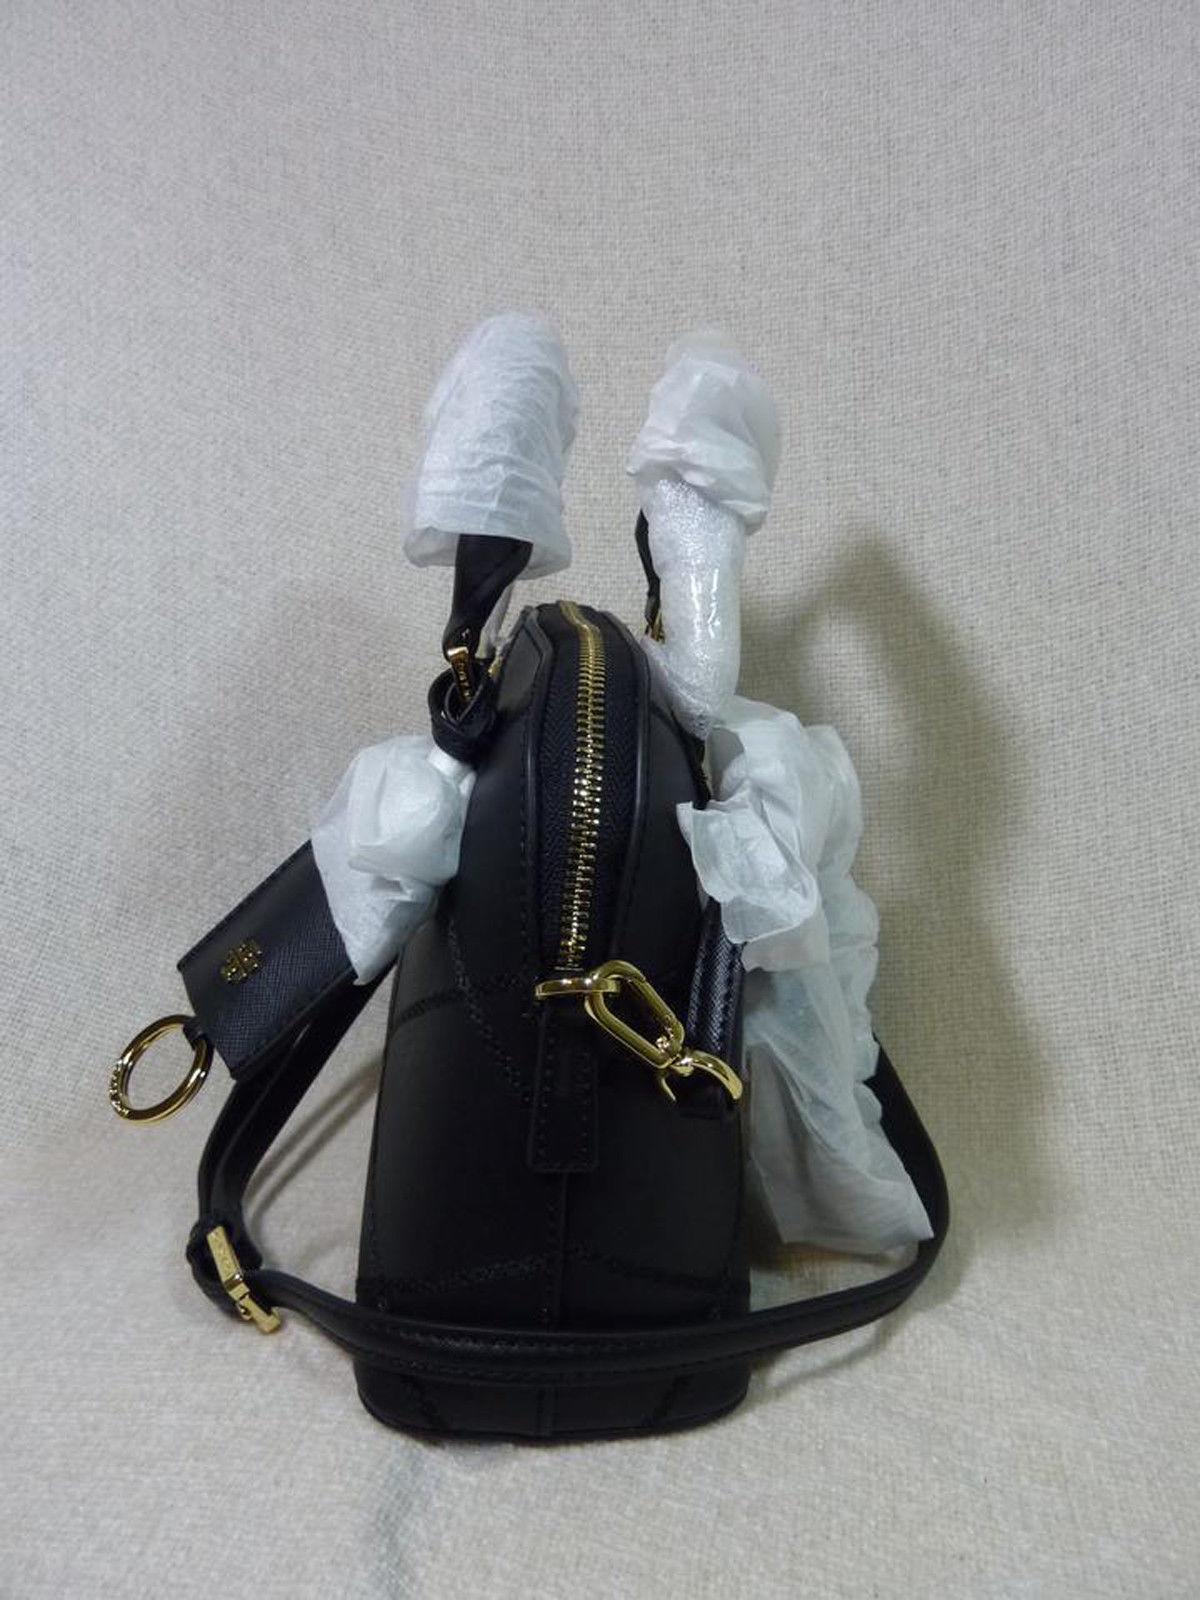 NWT Tory Burch Black Saffiano Mini Robinson Stitched Dome Cross Body Bag  - $425 image 3